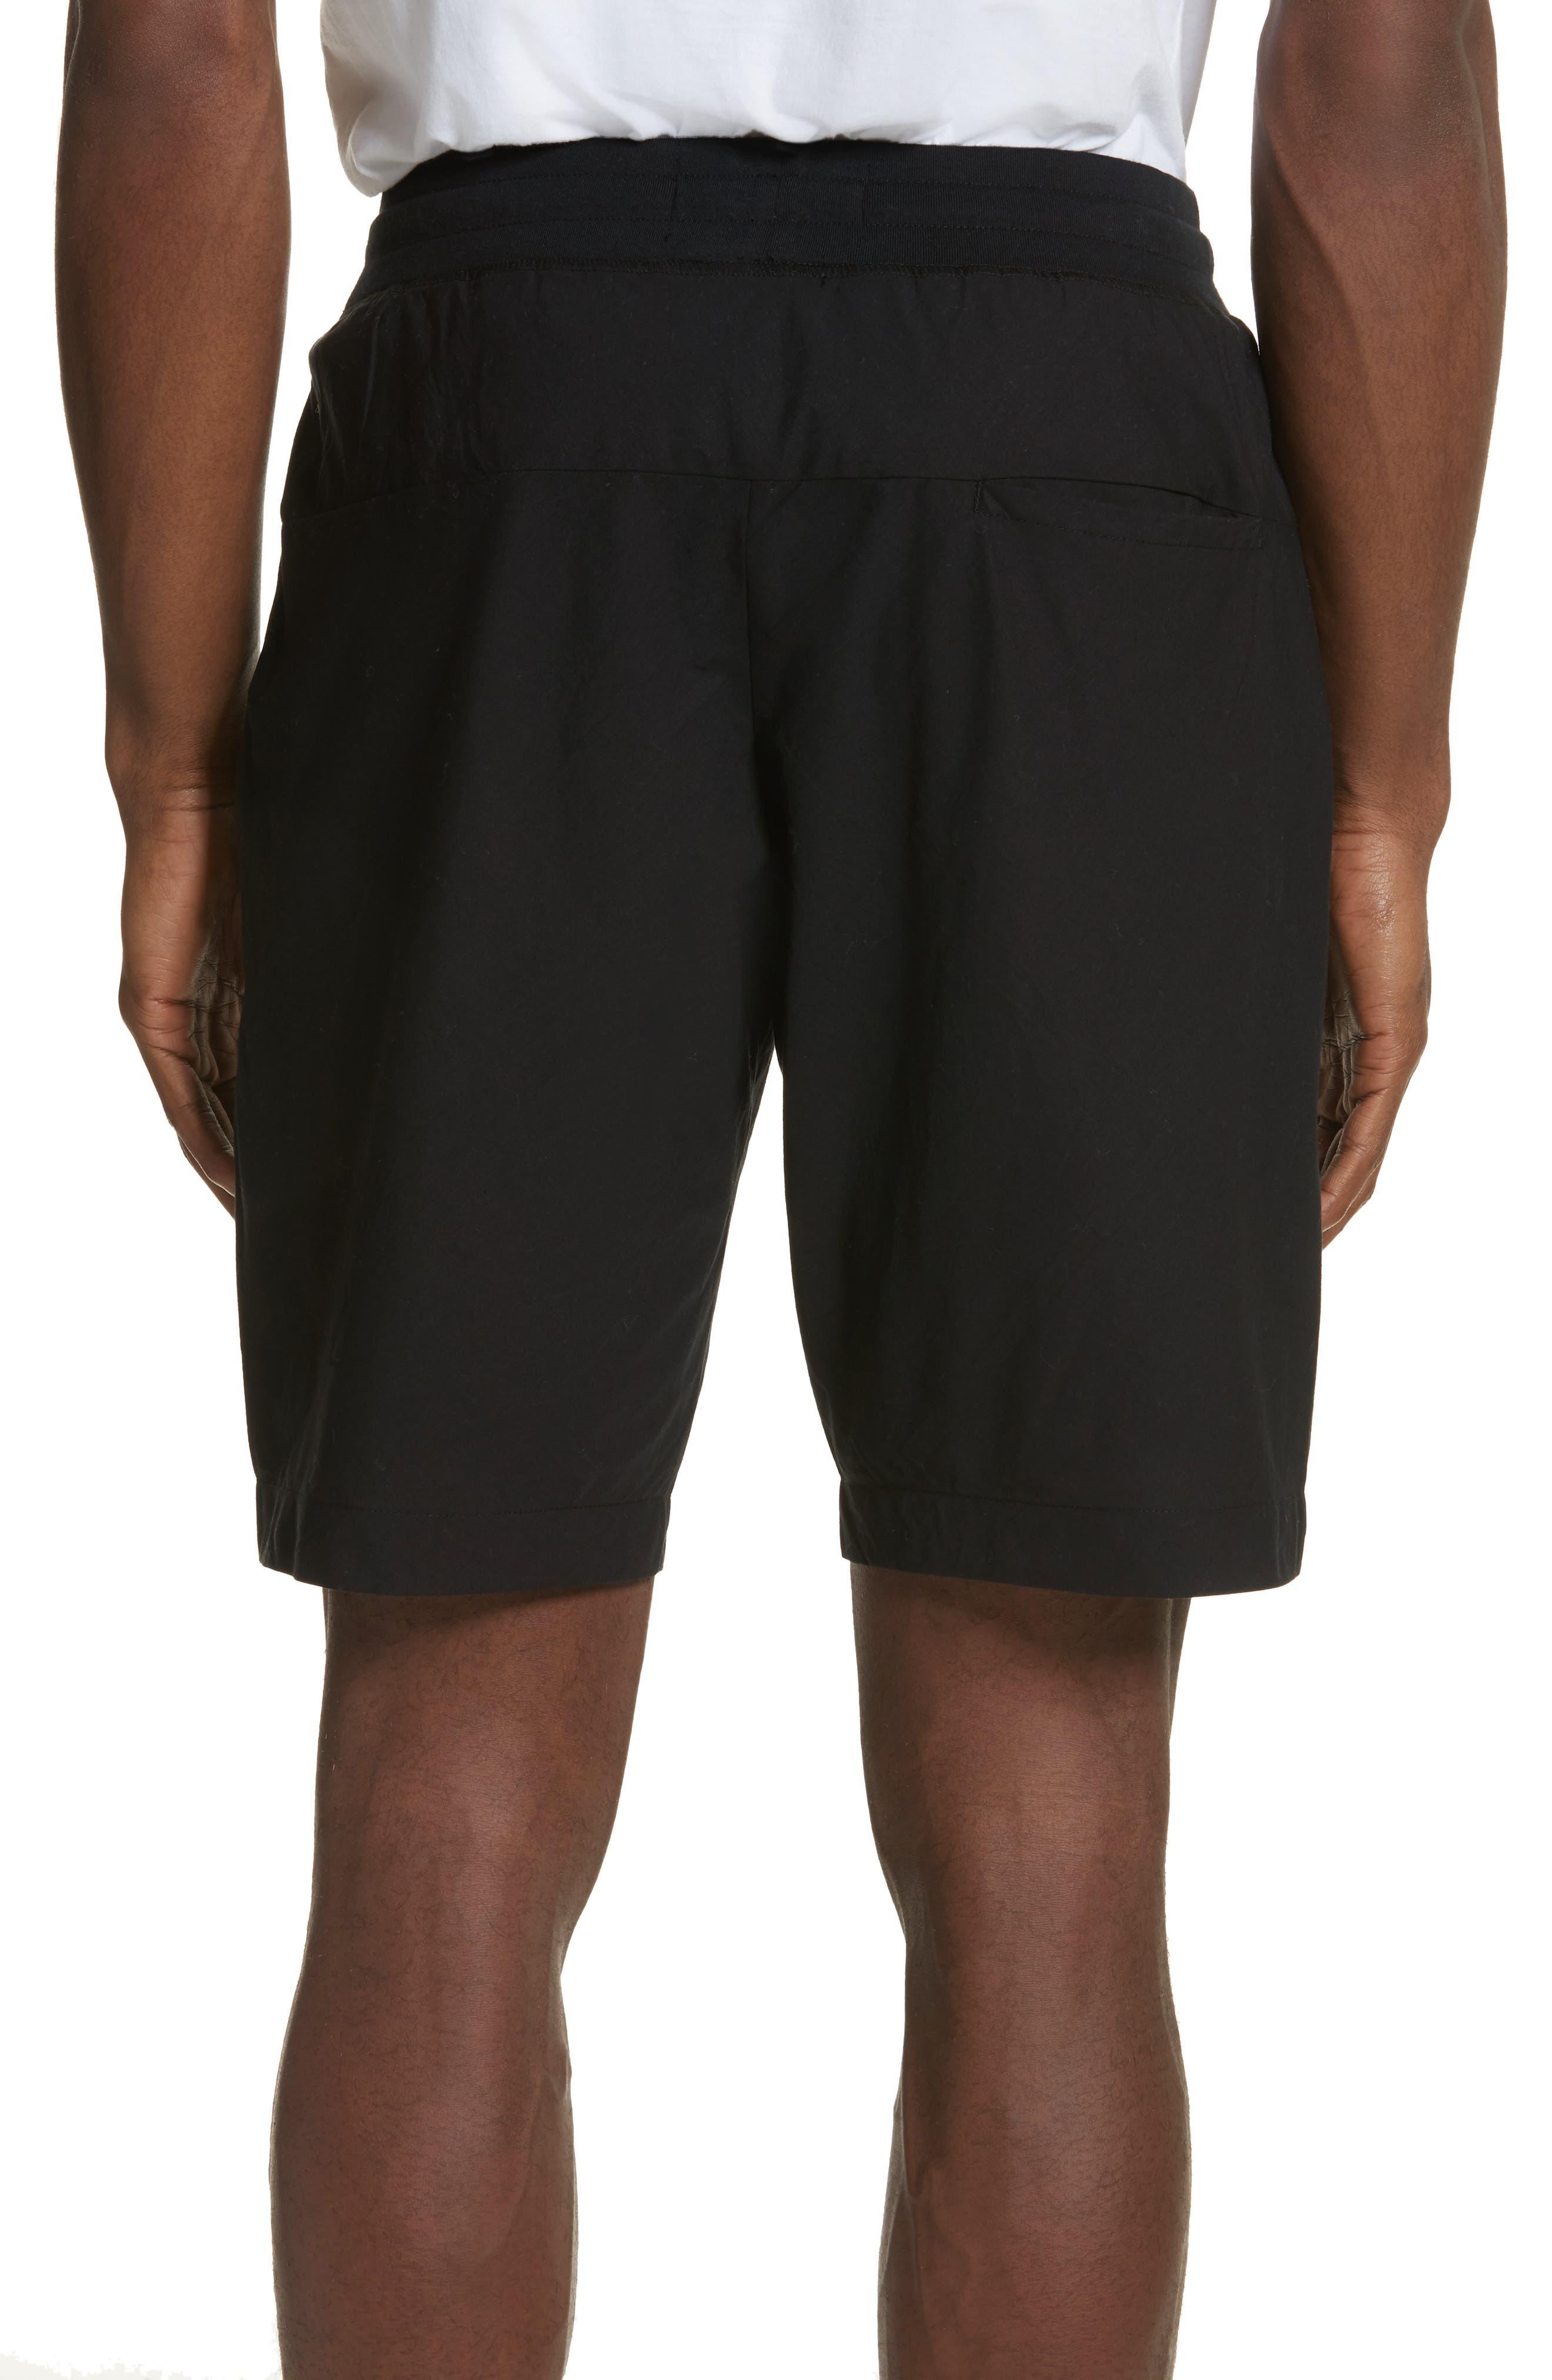 Overlay Shorts,                             Alternate thumbnail 2, color,                             Black